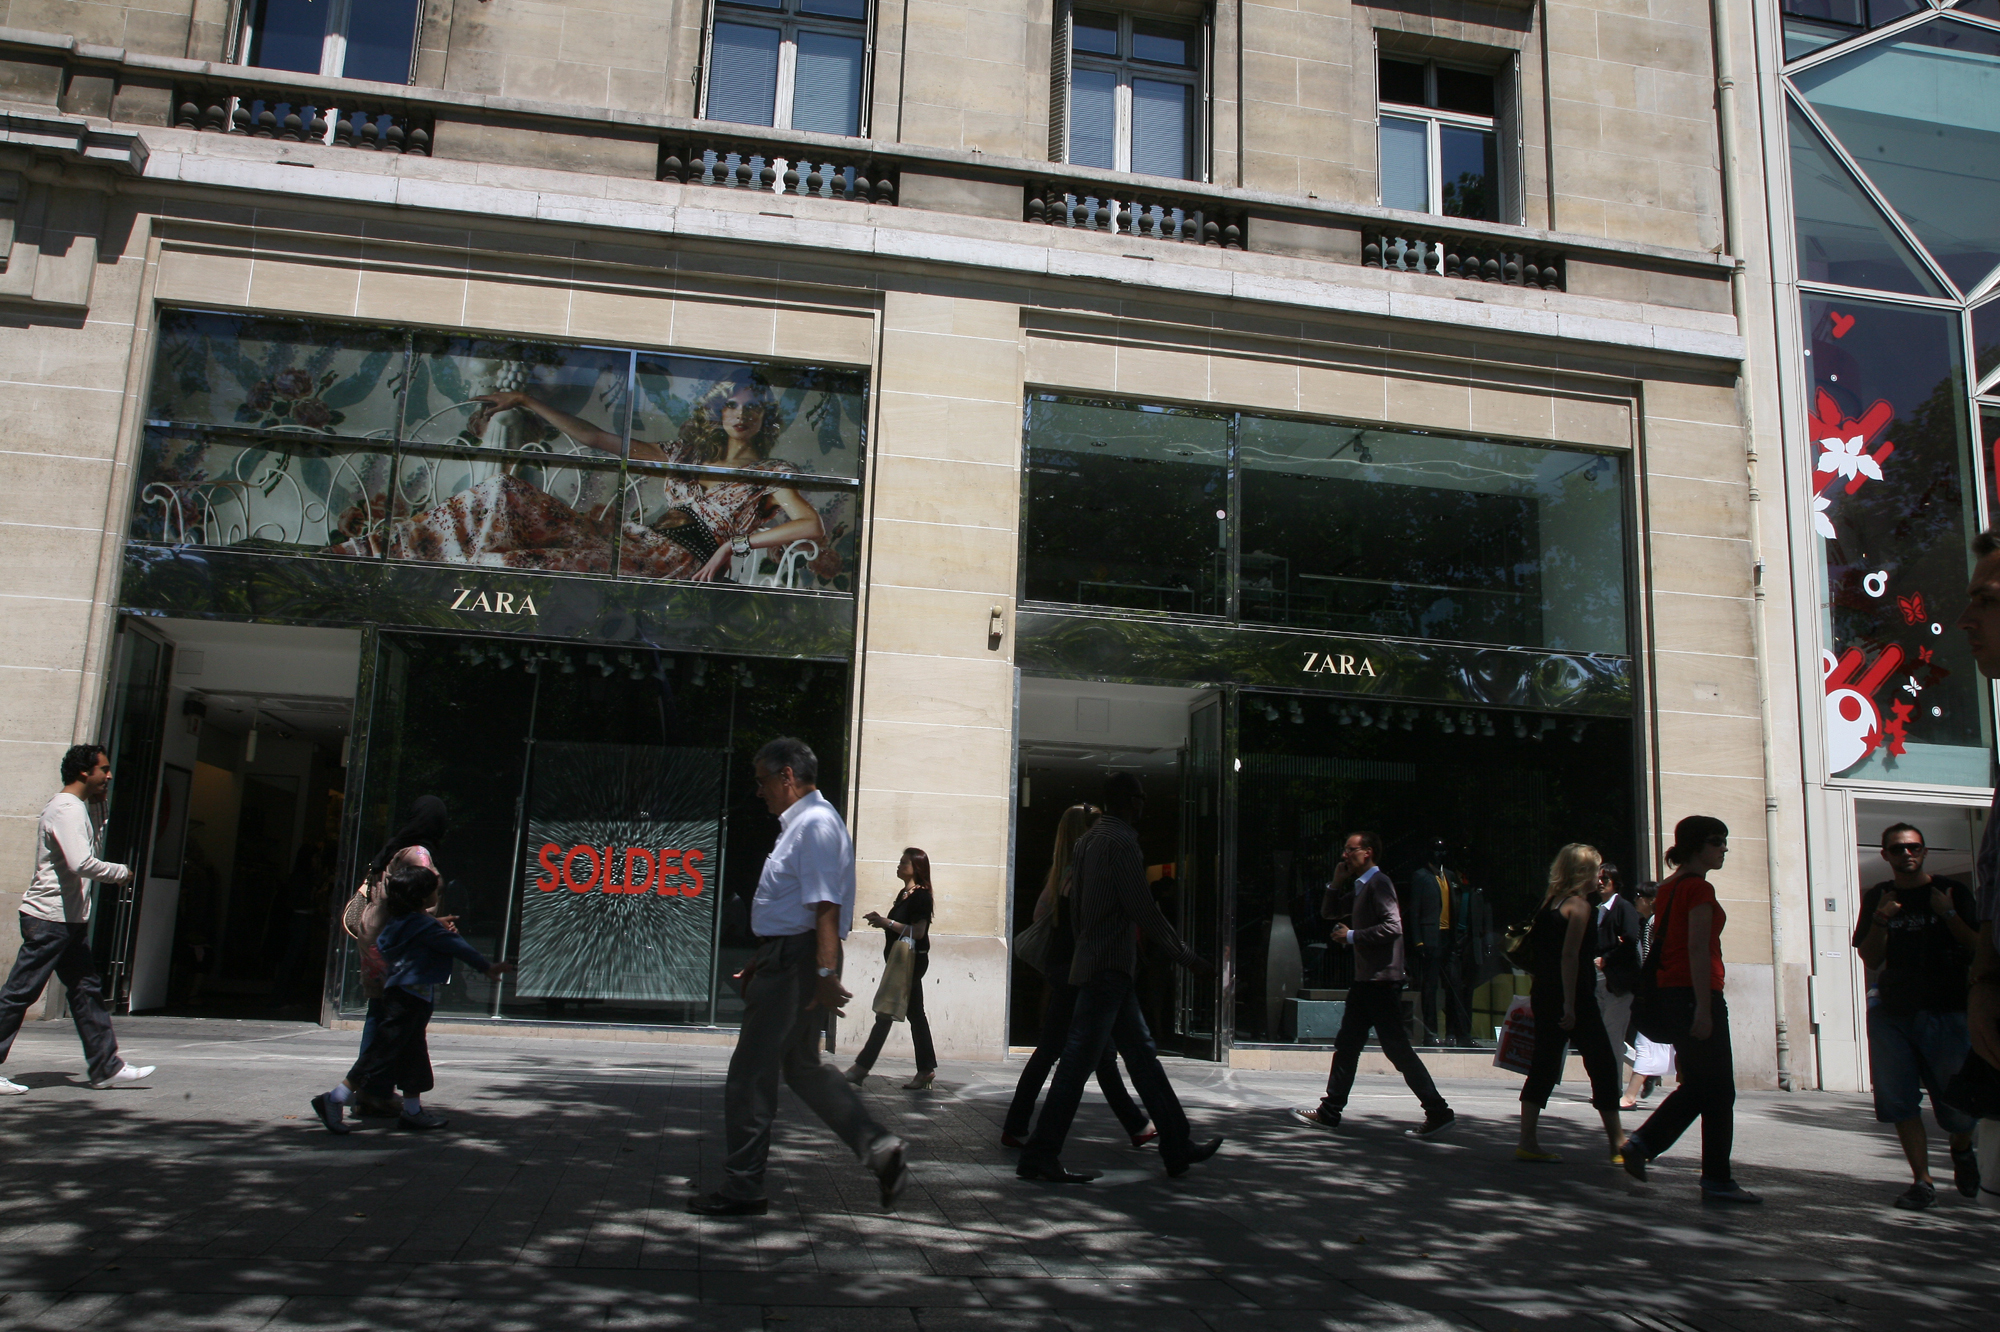 Mauvais buzz zara retire de la vente un tee shirt for Vente lieu atypique paris